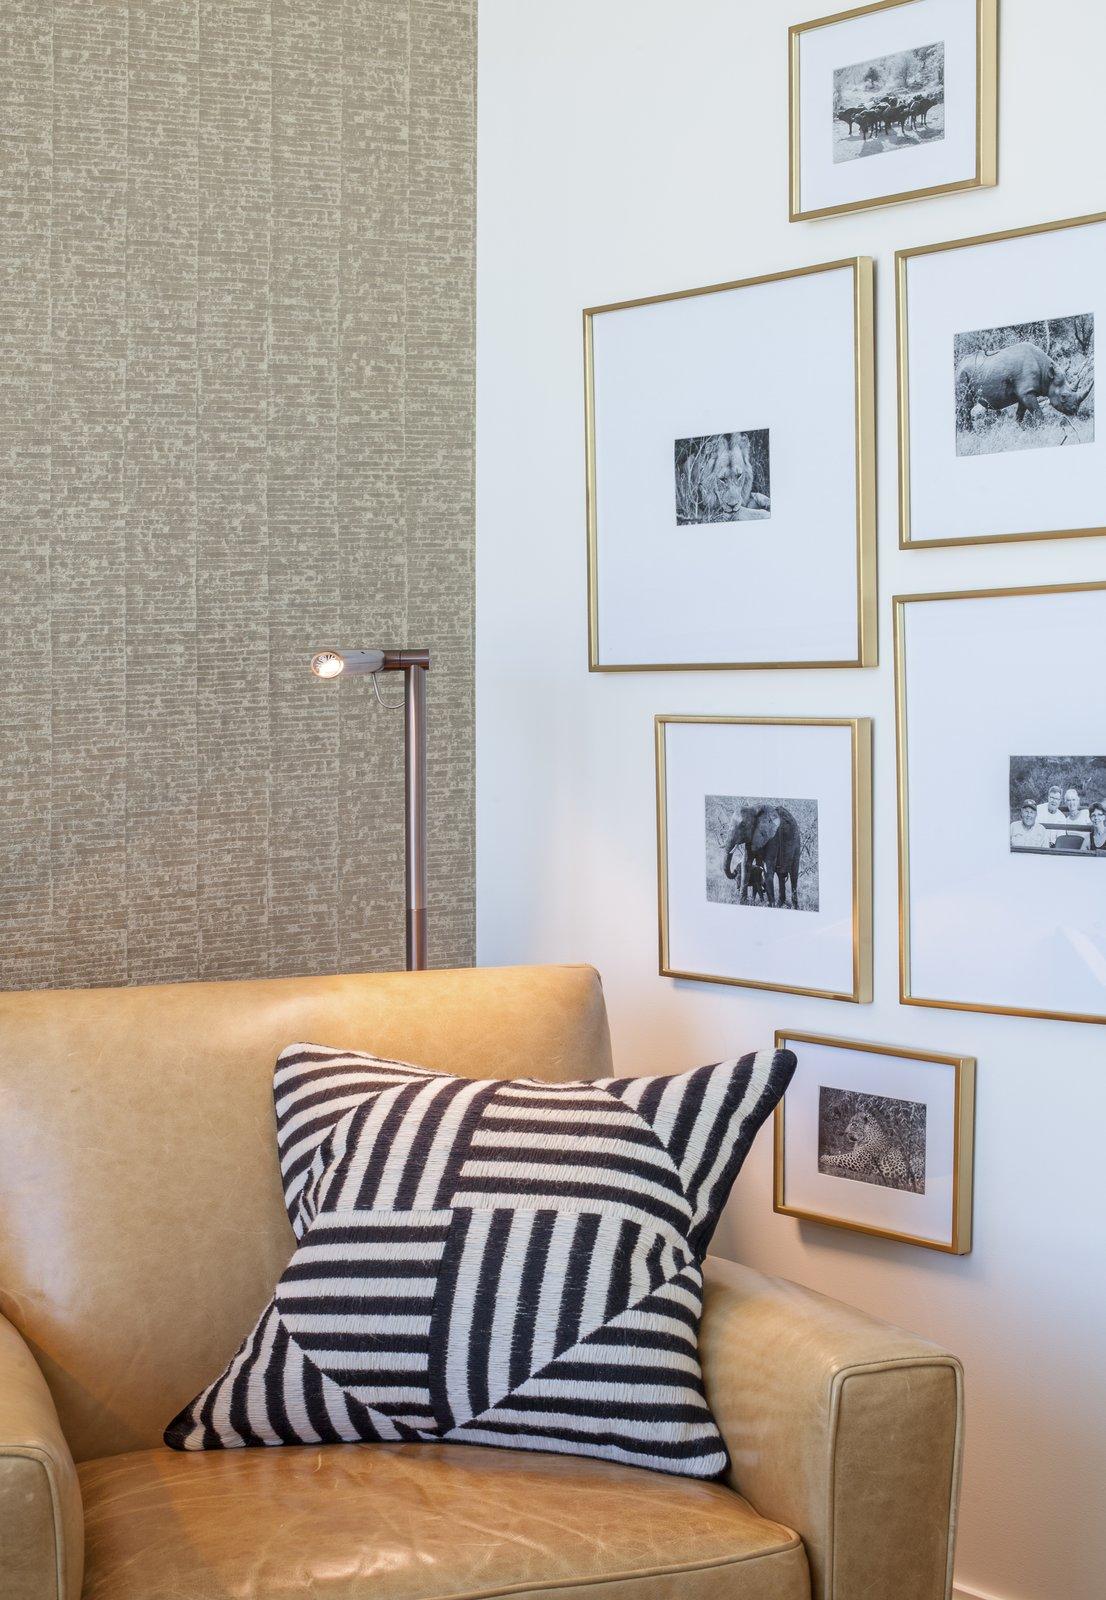 Bedroom, Chair, and Floor Lighting  Downsize Upstyle